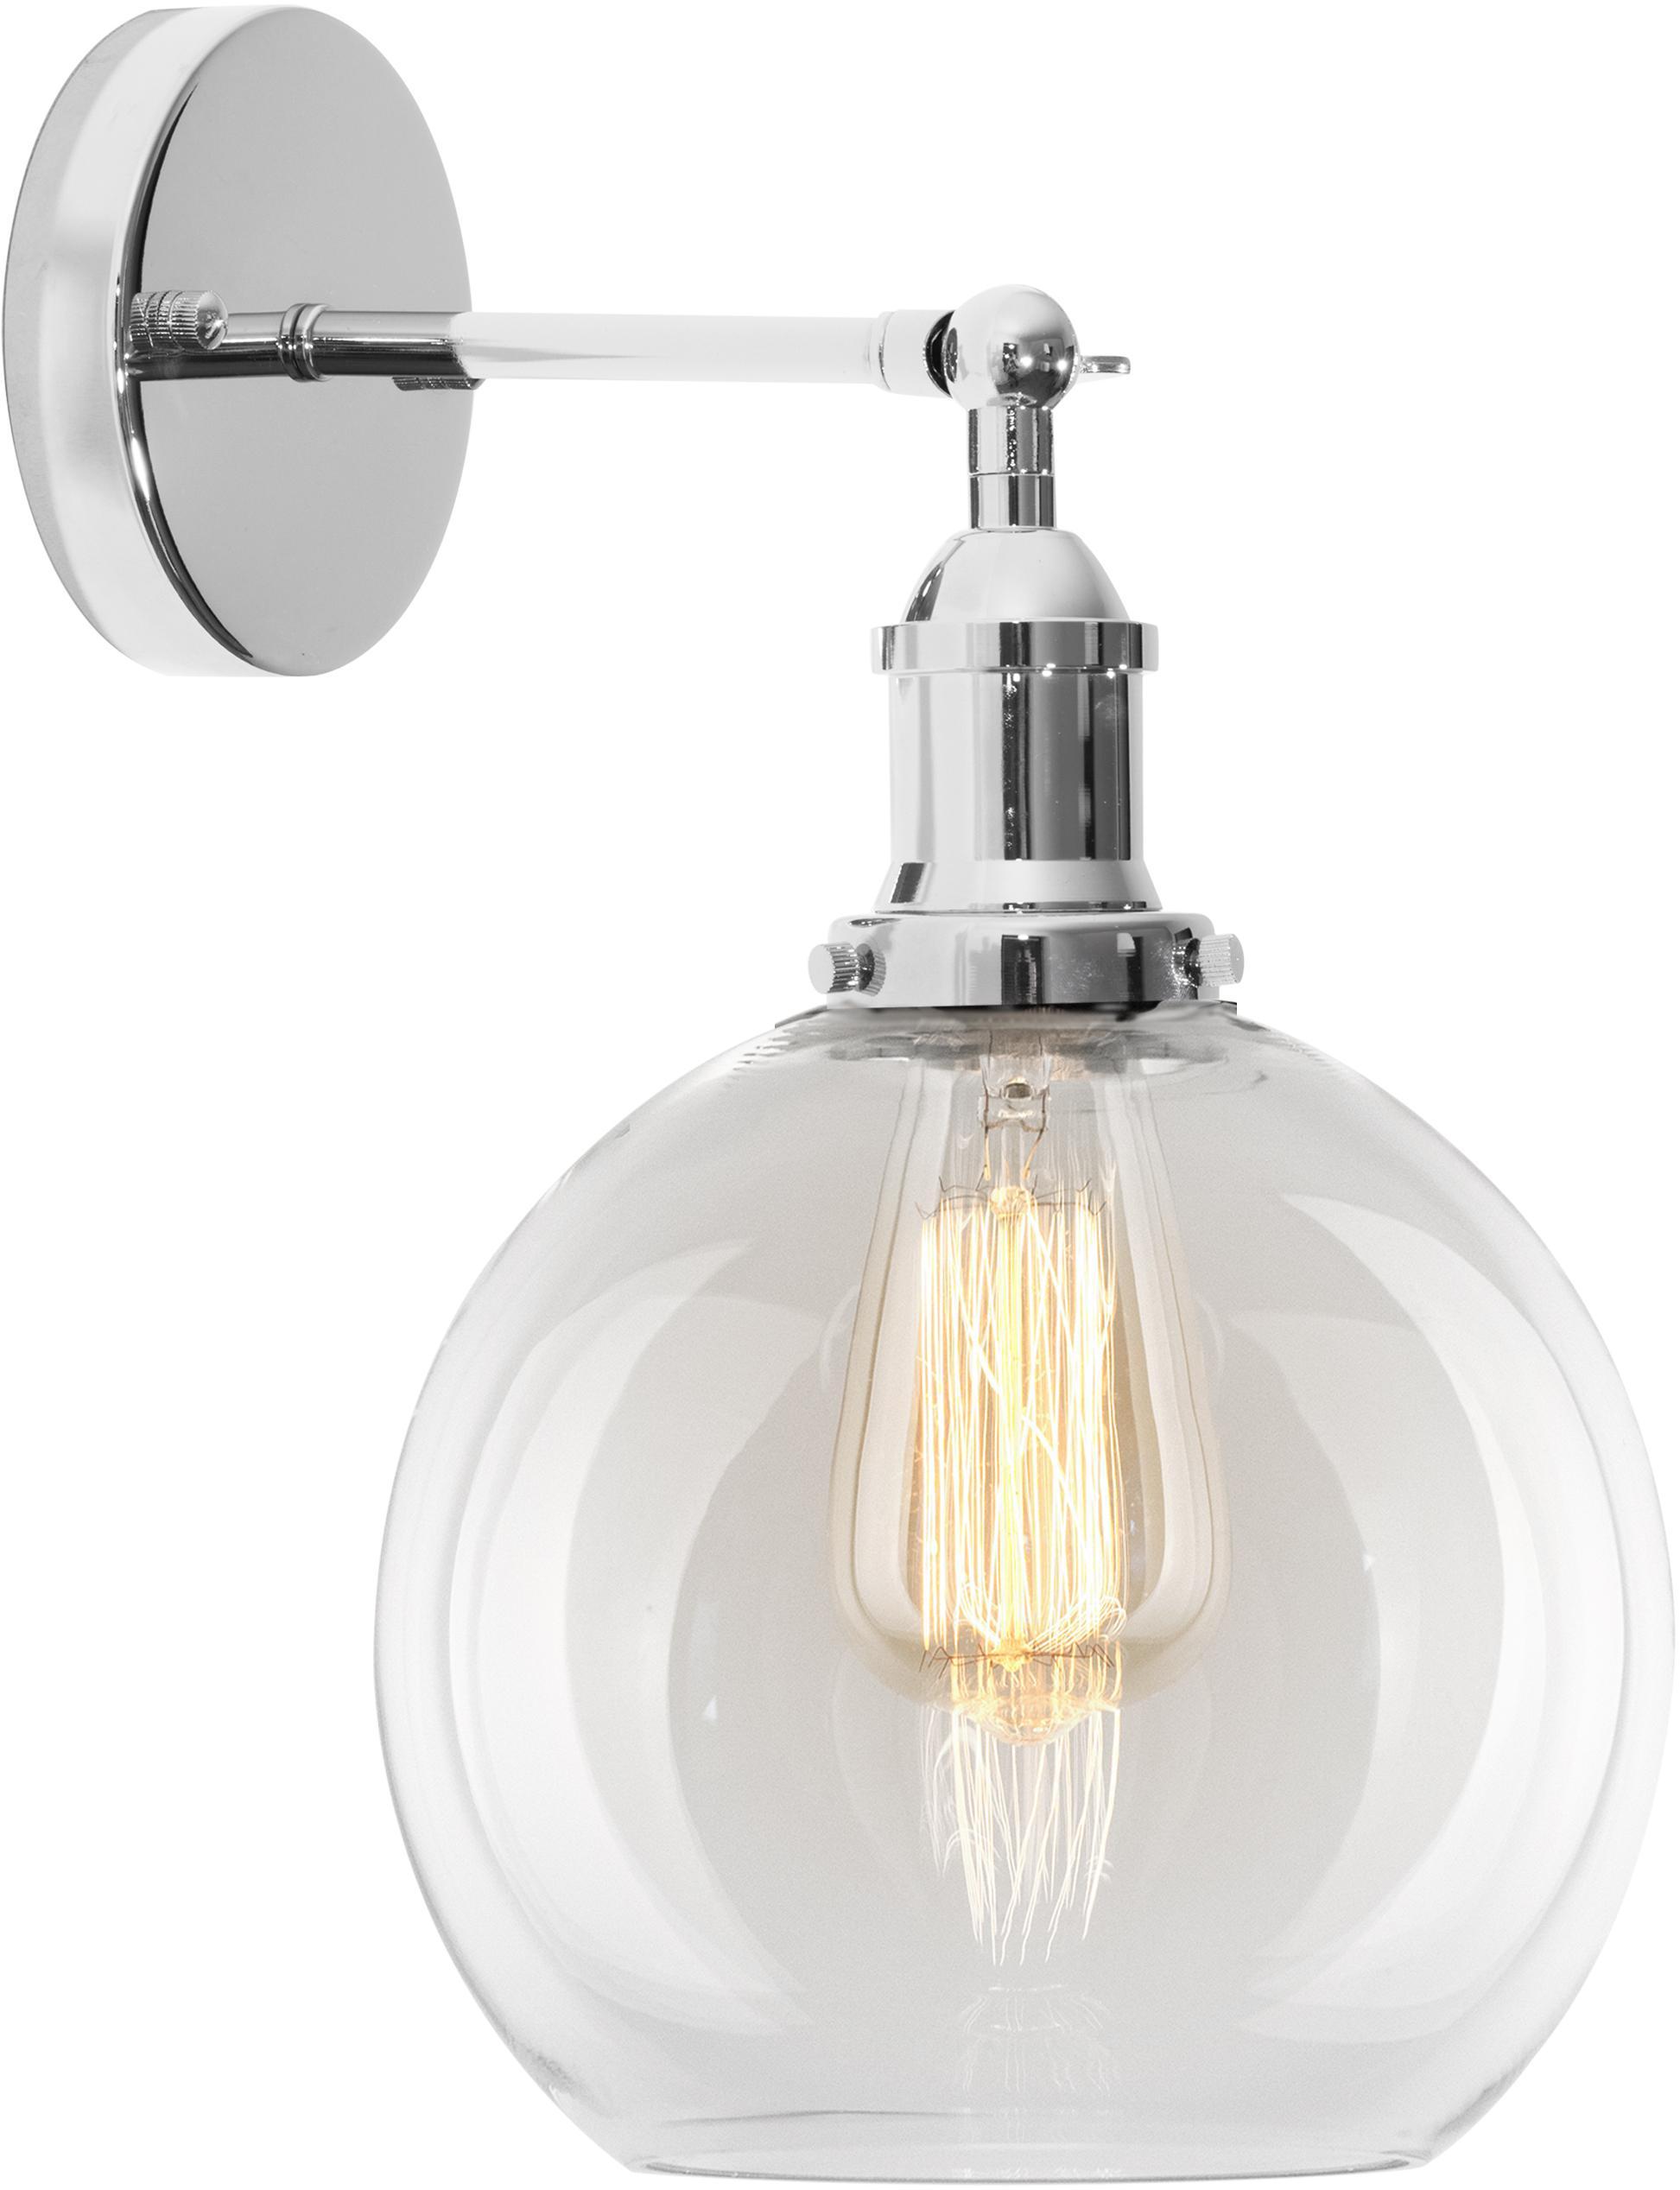 Wandleuchte New York Loft No.2, Lampenschirm: Glas, Chrom, Transparent, 20 x 30 cm